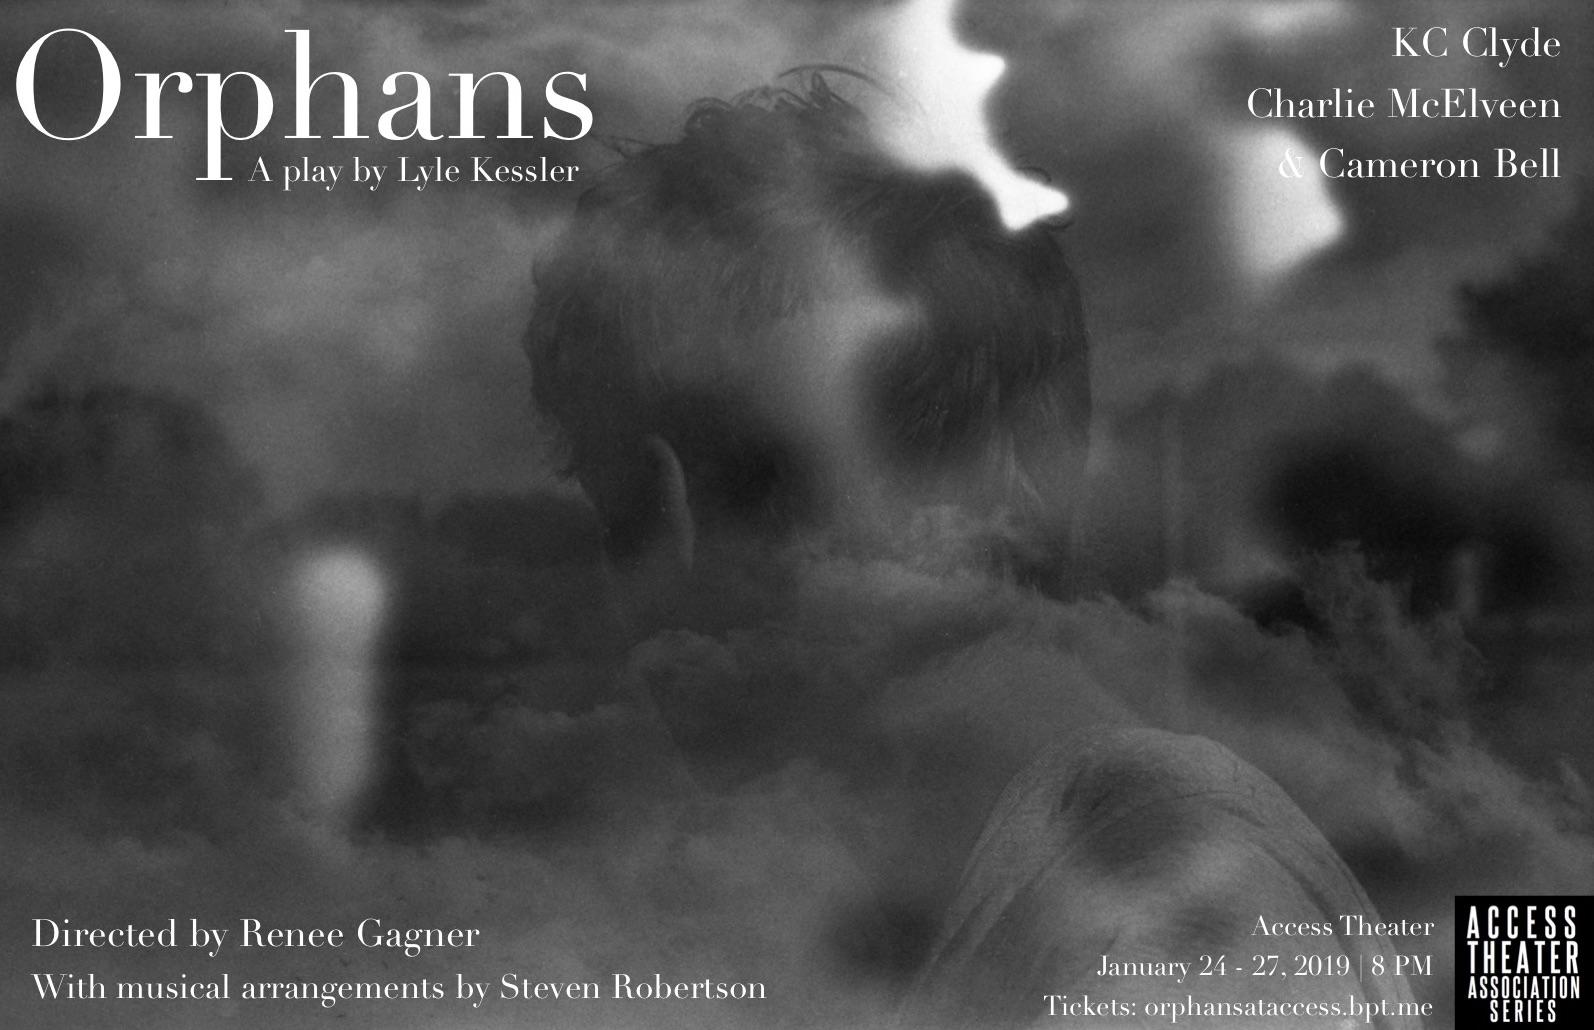 Orphans e flyer.jpg